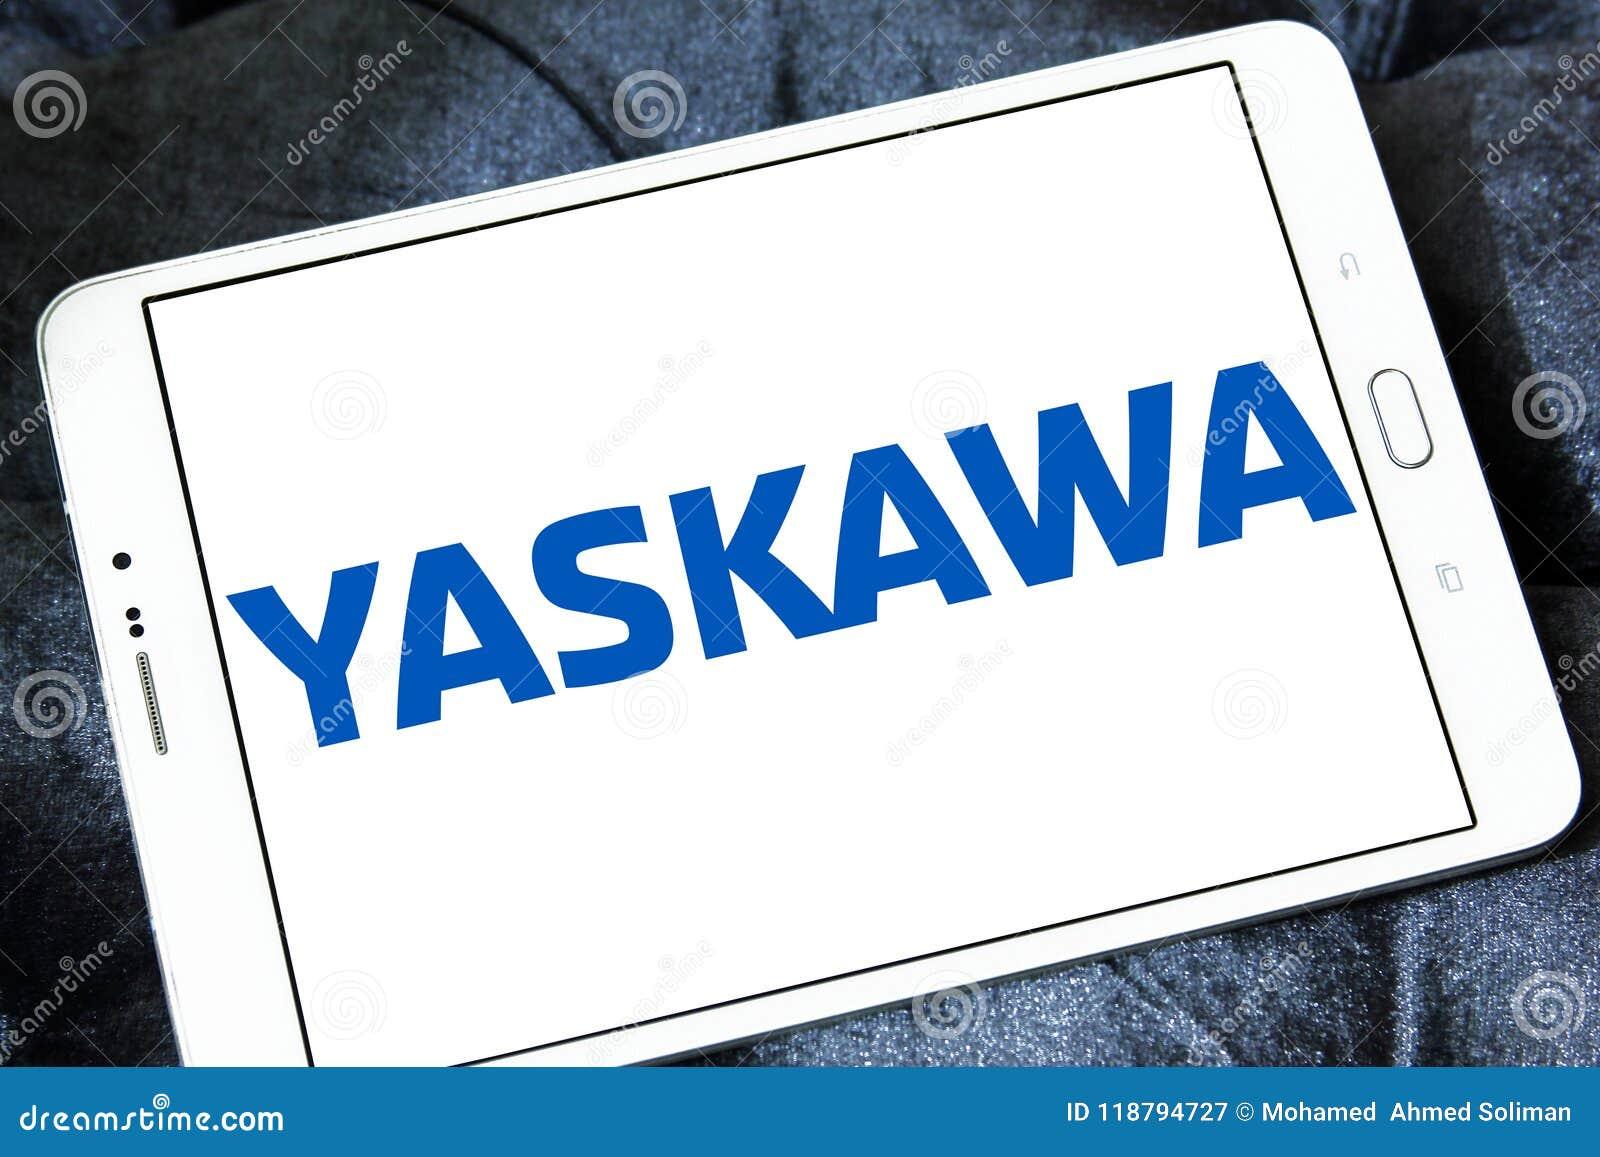 Yaskawa Electric Corporation Logo Editorial Photography